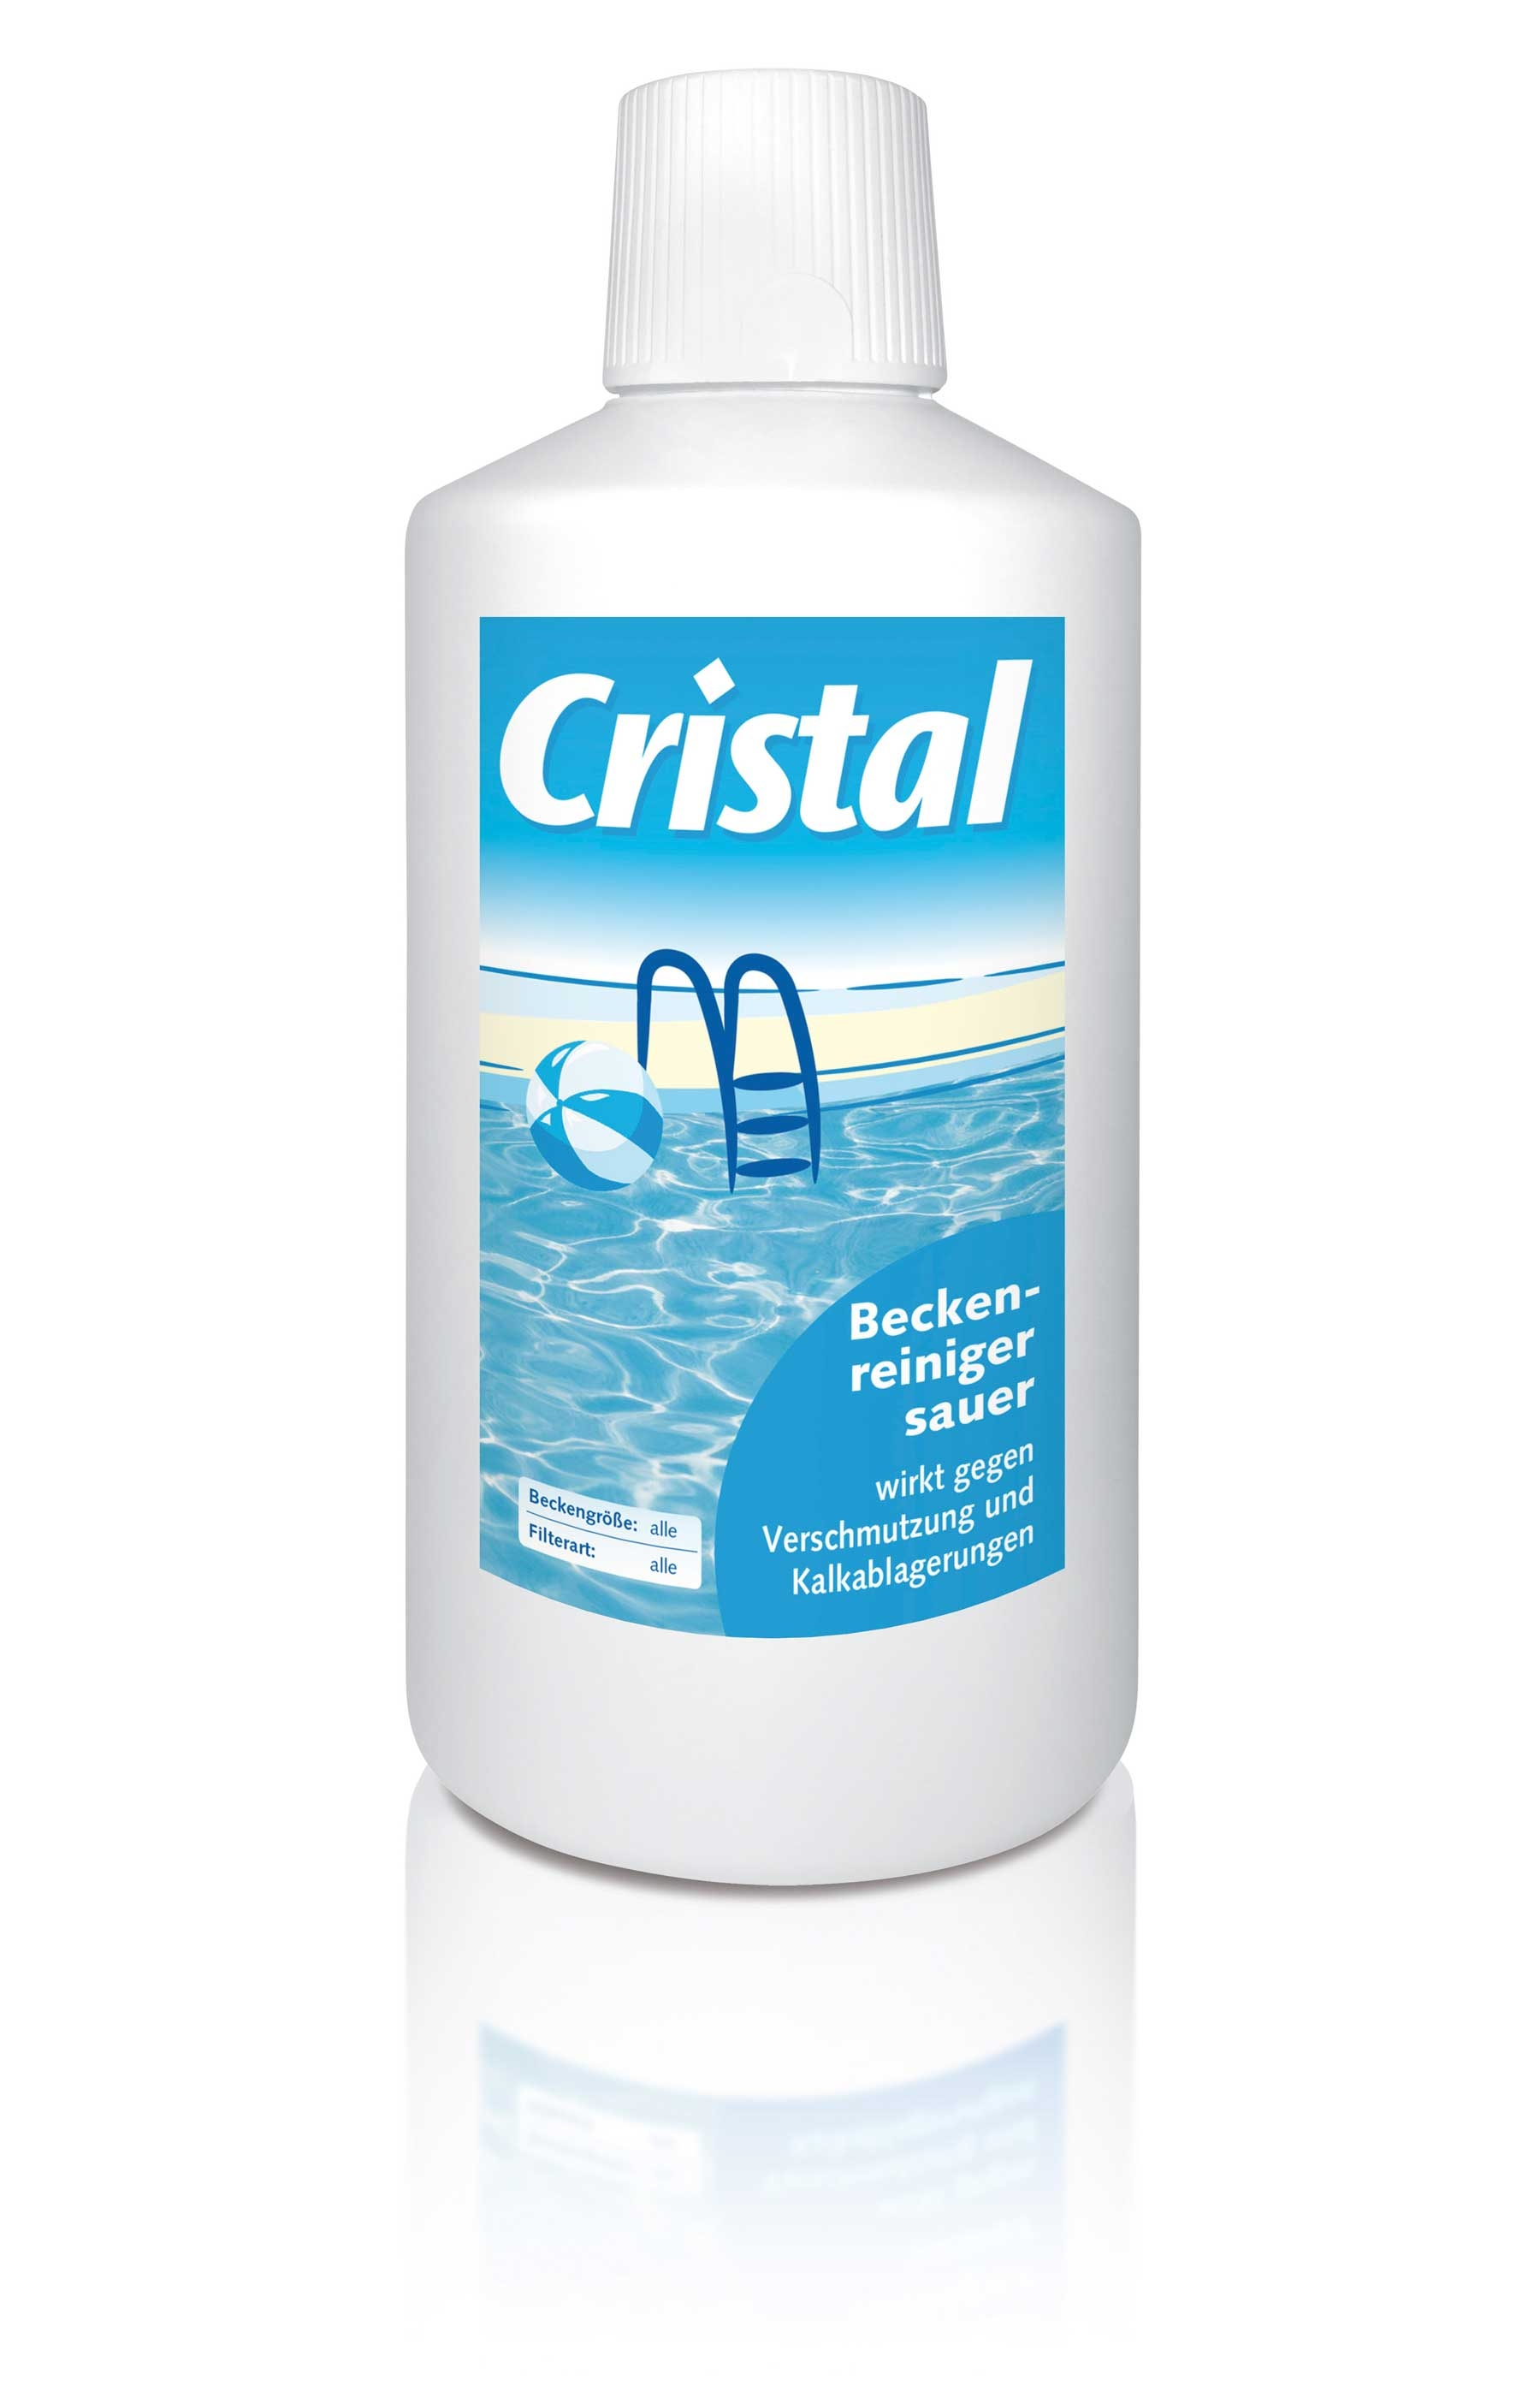 Cristal Beckenreiniger sauer